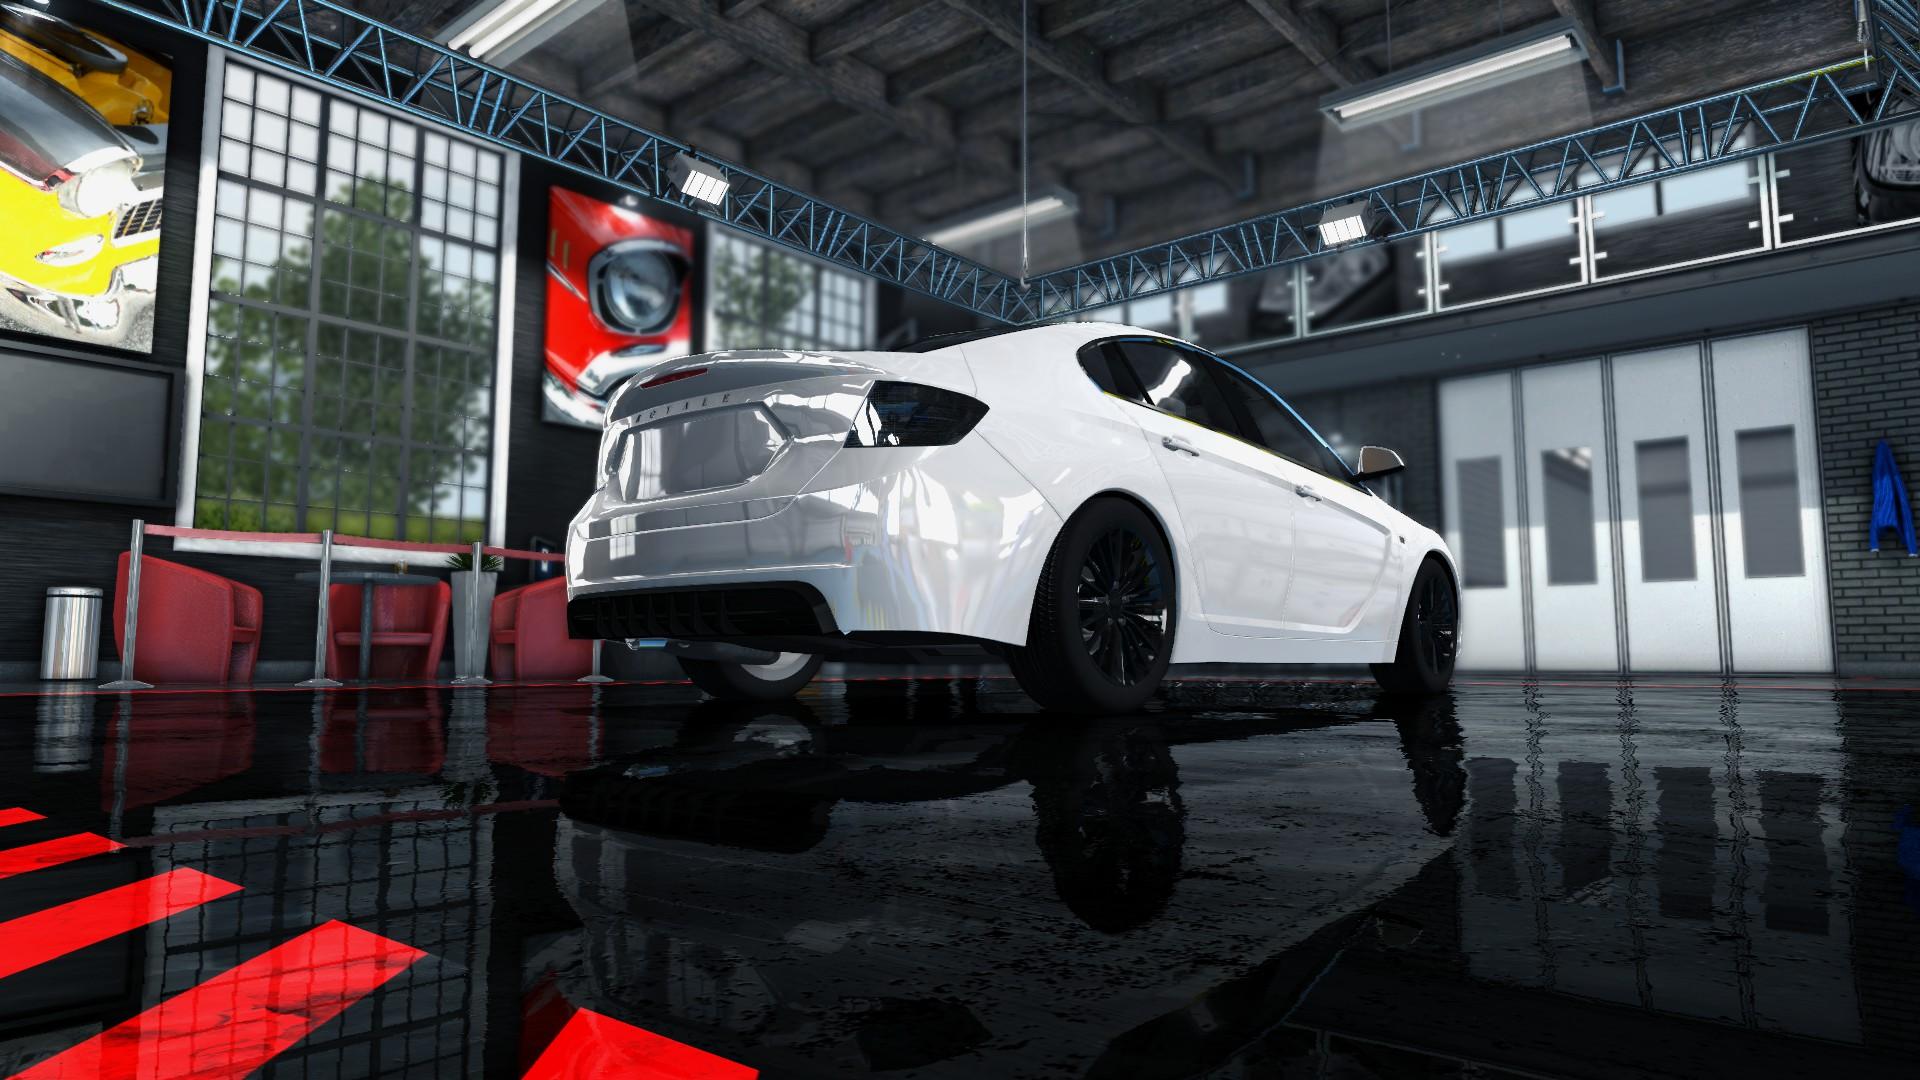 download car mechanic simulator 2015 visual tuning full pc game. Black Bedroom Furniture Sets. Home Design Ideas